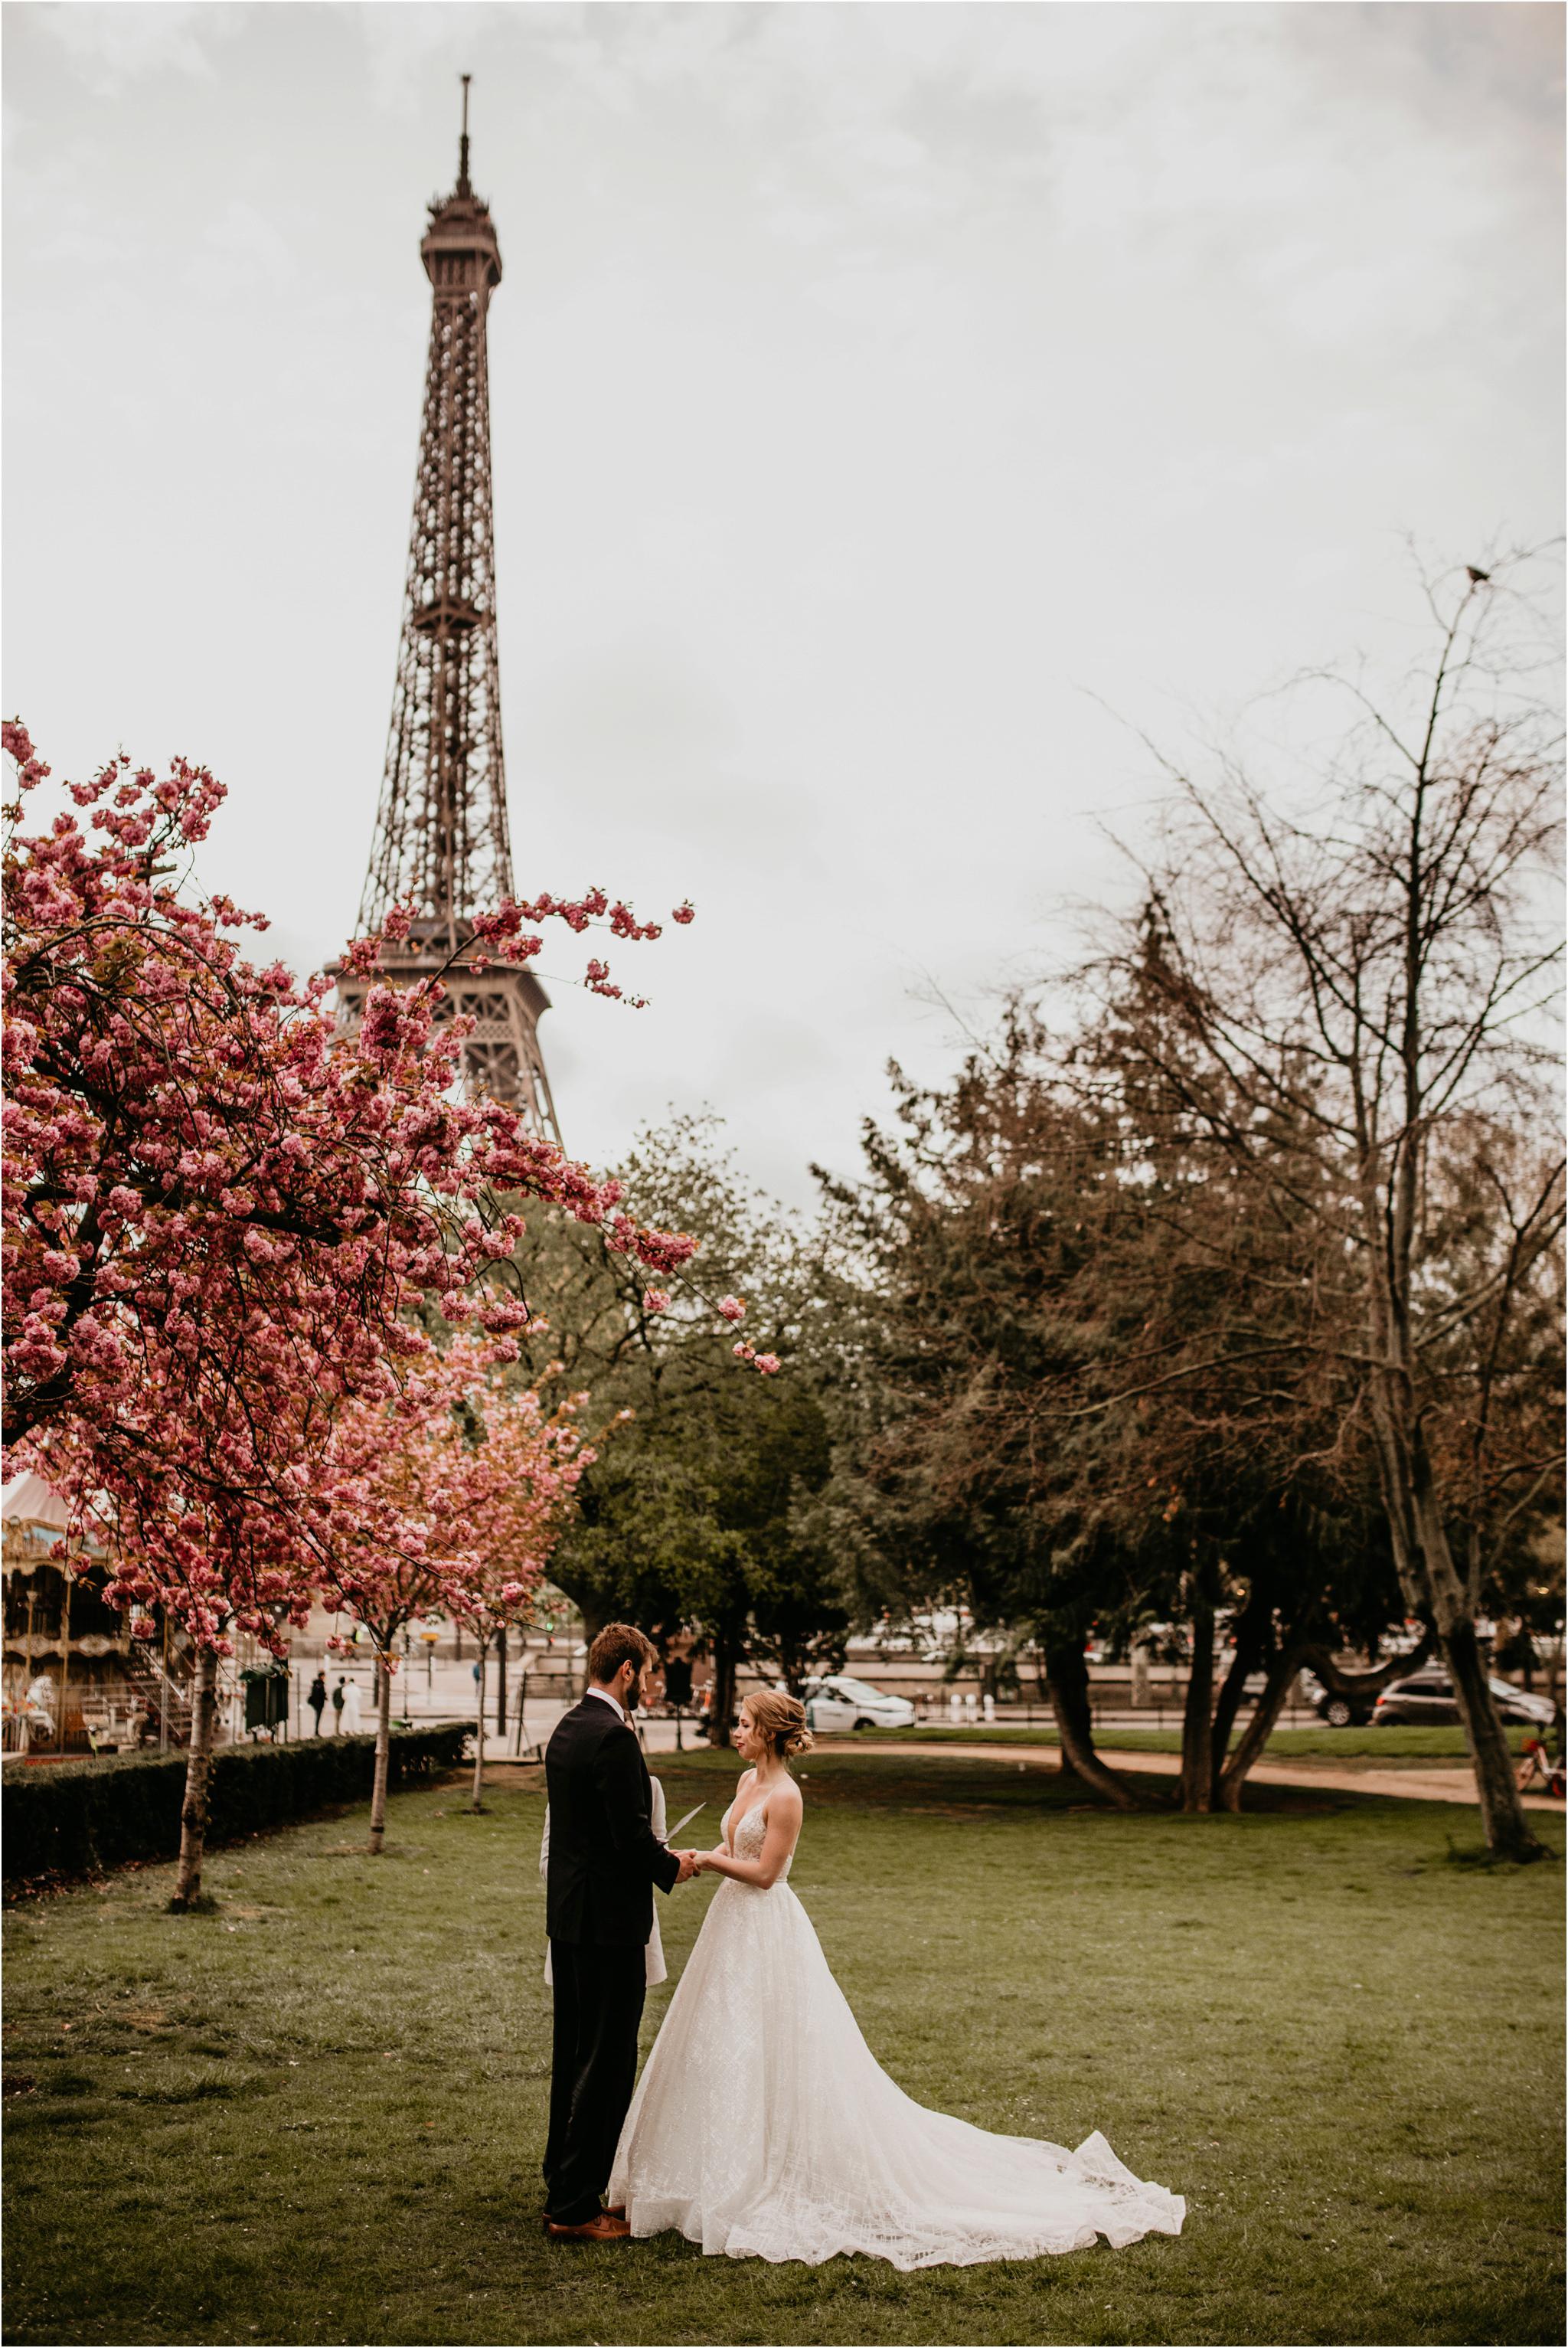 miranda-and-jared-paris-elopement-destination-wedding-photographer-038.jpg